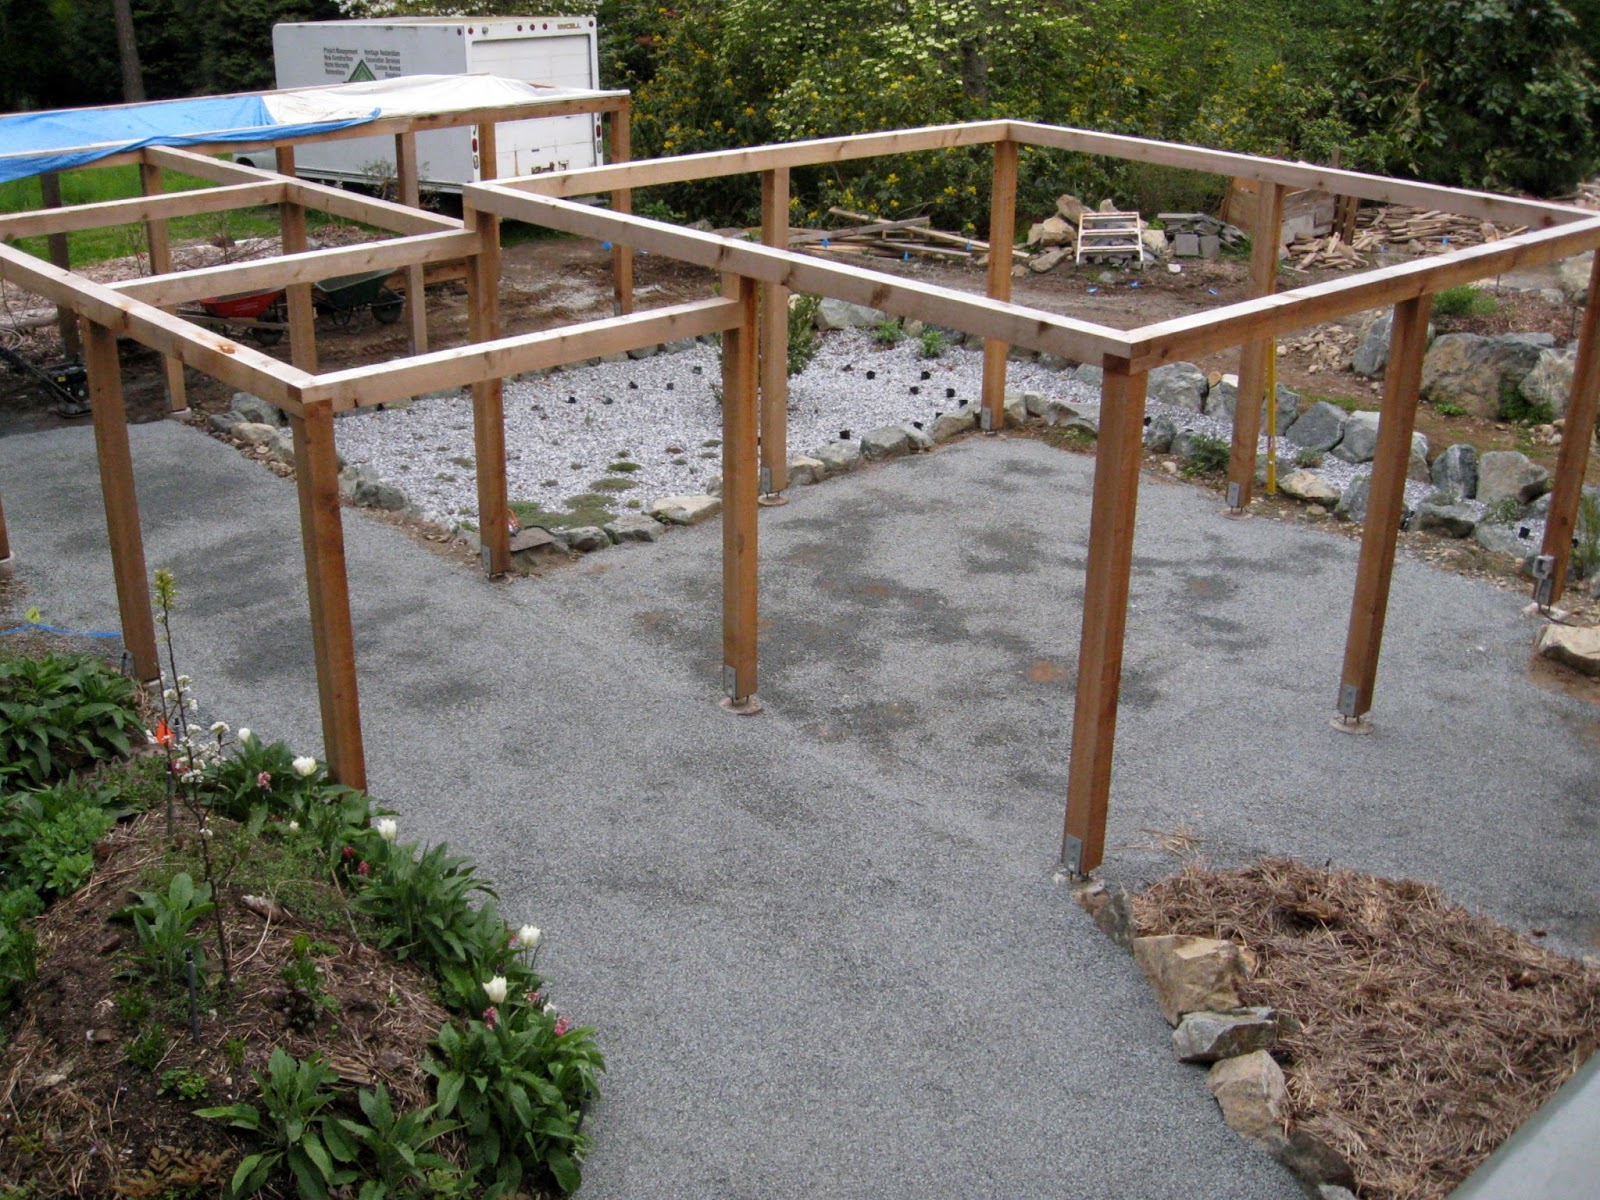 Lesley Turner Backyard Project Spreading The Gravel